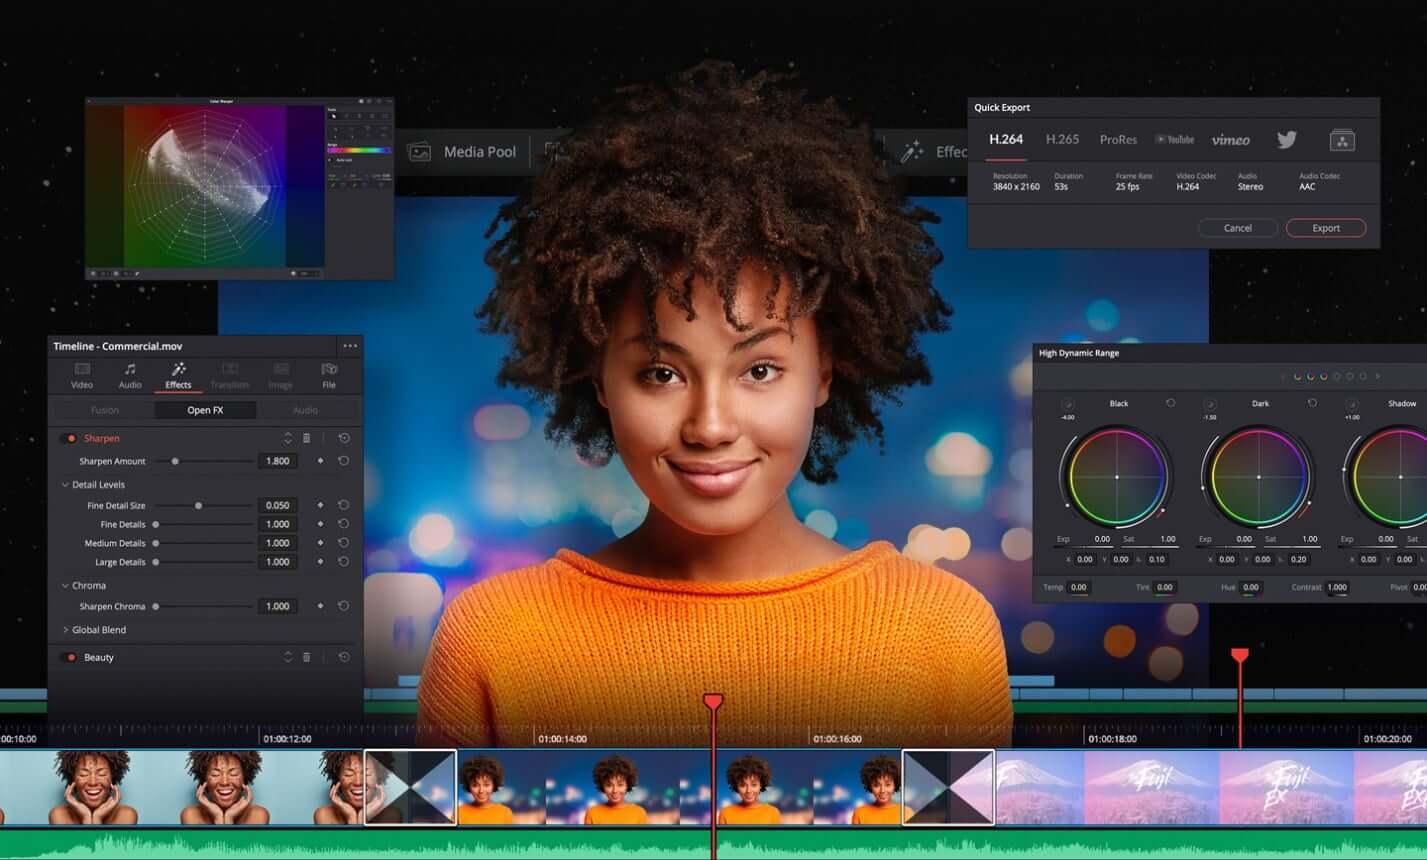 davinci-resolve-video-editor